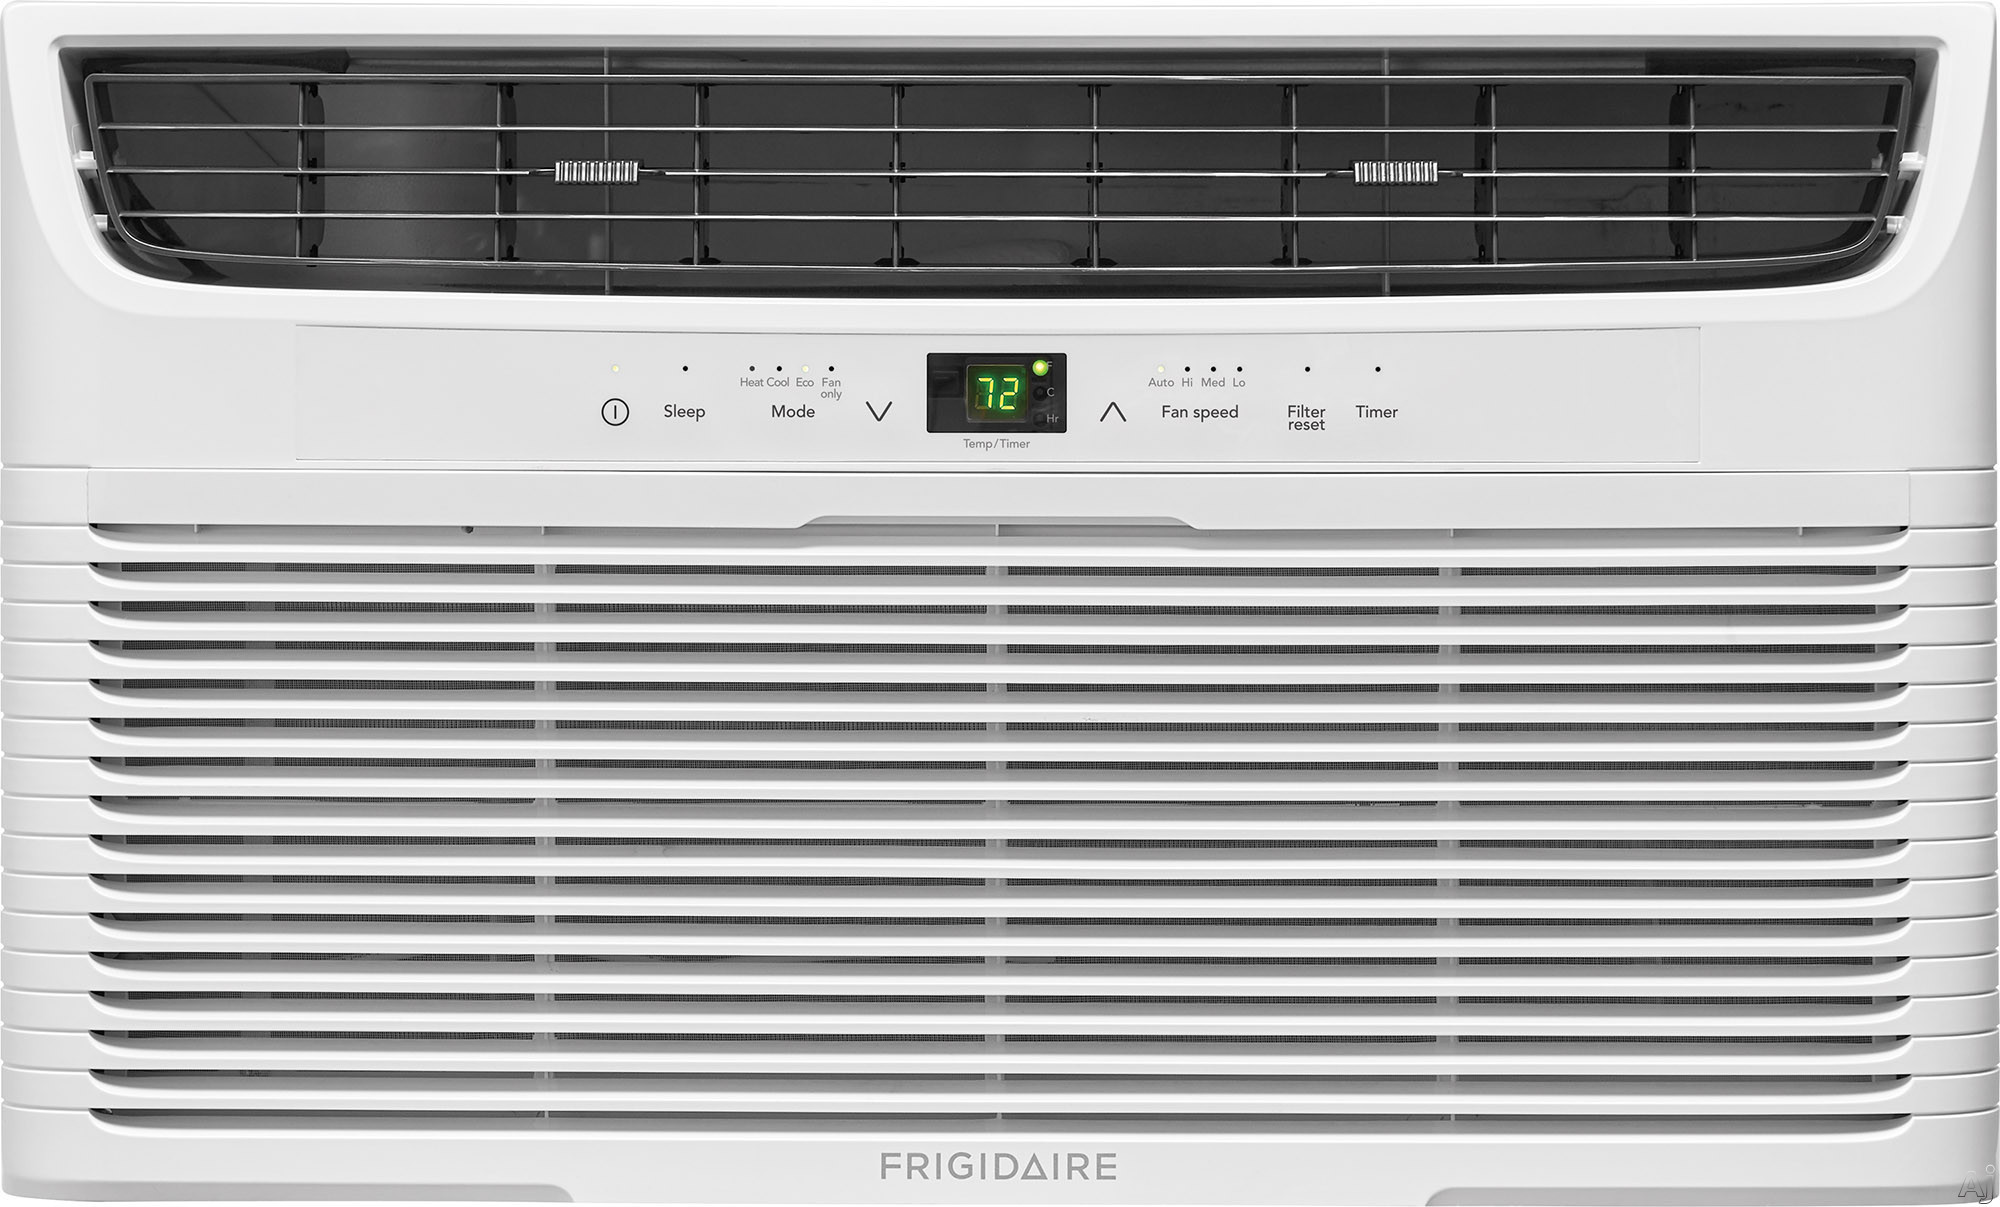 "Frigidaire FFTH1222U2 12,000 BTU Room Air Conditioner with Supplemental Heating Option, Effortlessâ""¢ Remote Temperature Control, Programmable 24-Hour Timer, Effortlessâ""¢ Clean Filter, Effort"